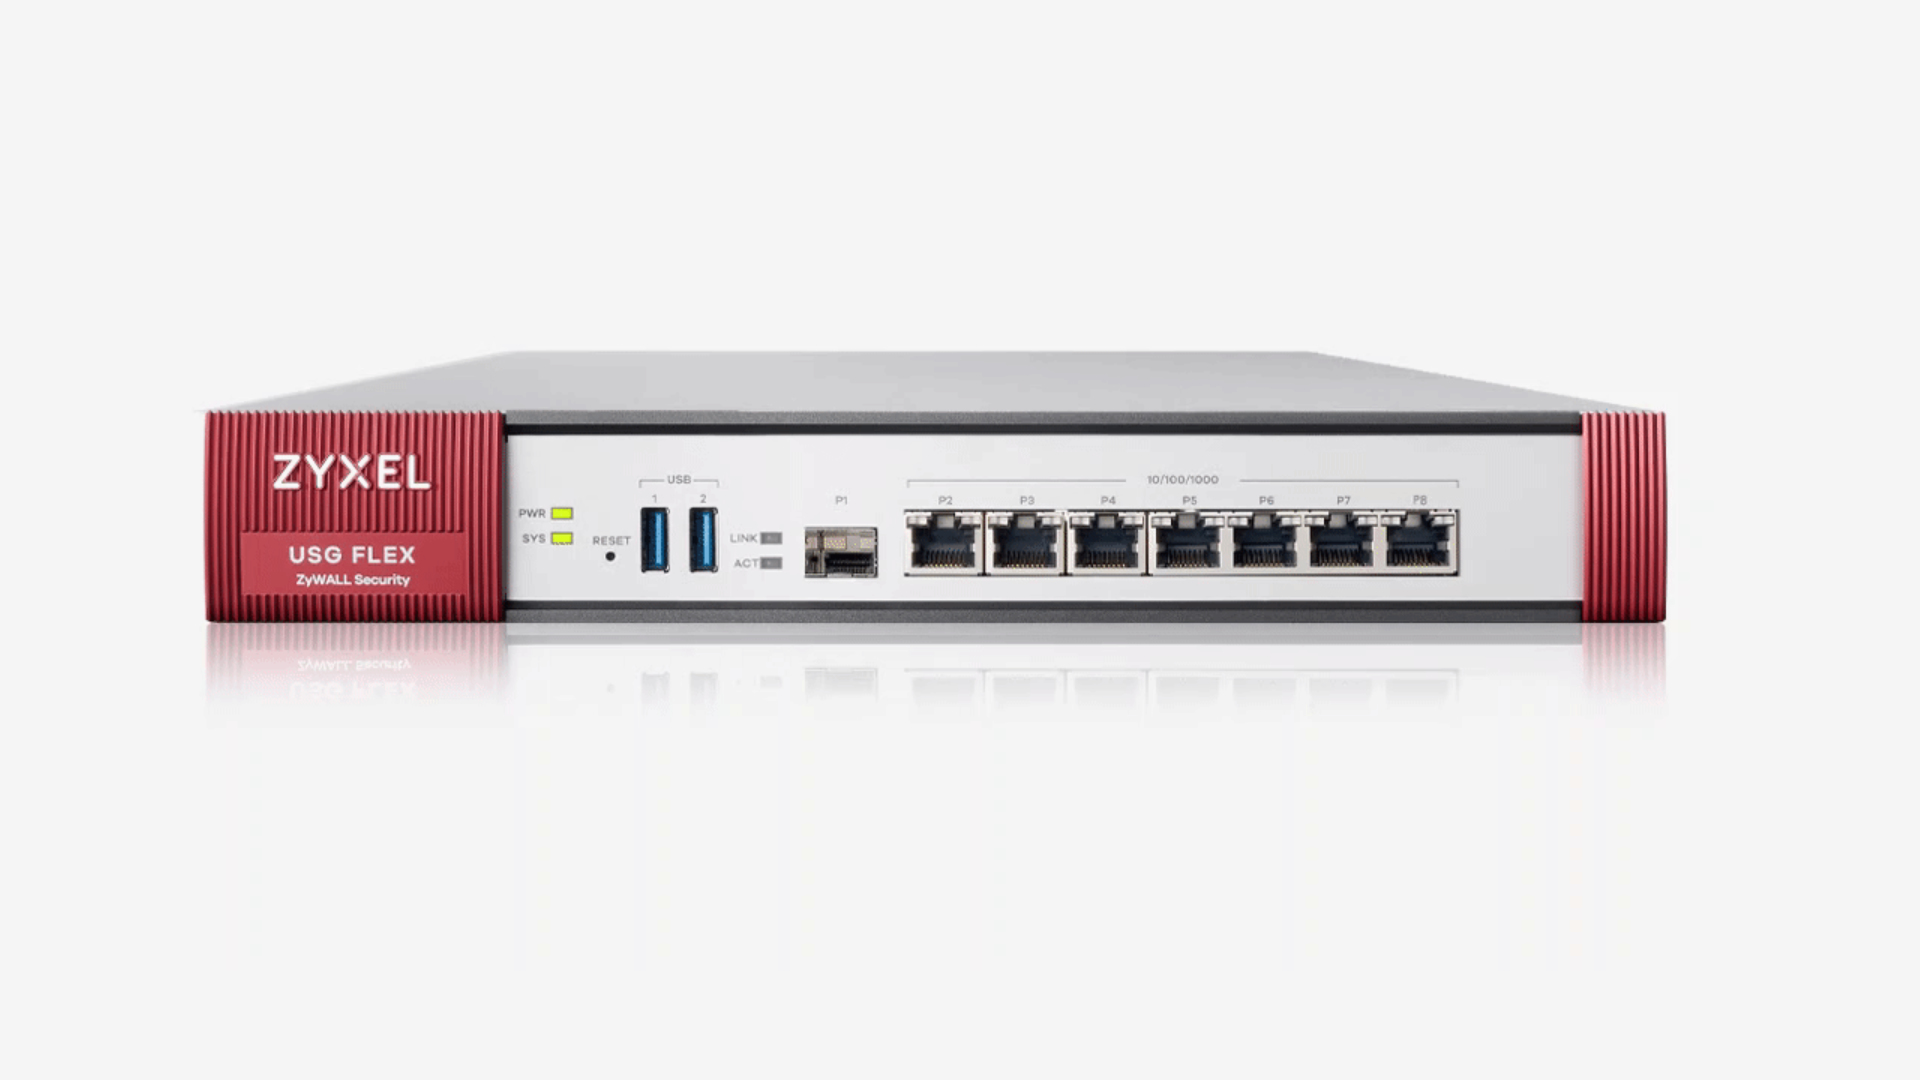 Zyxel USG Flex 200 cortafuegos (hardware) 1800 Mbit/s